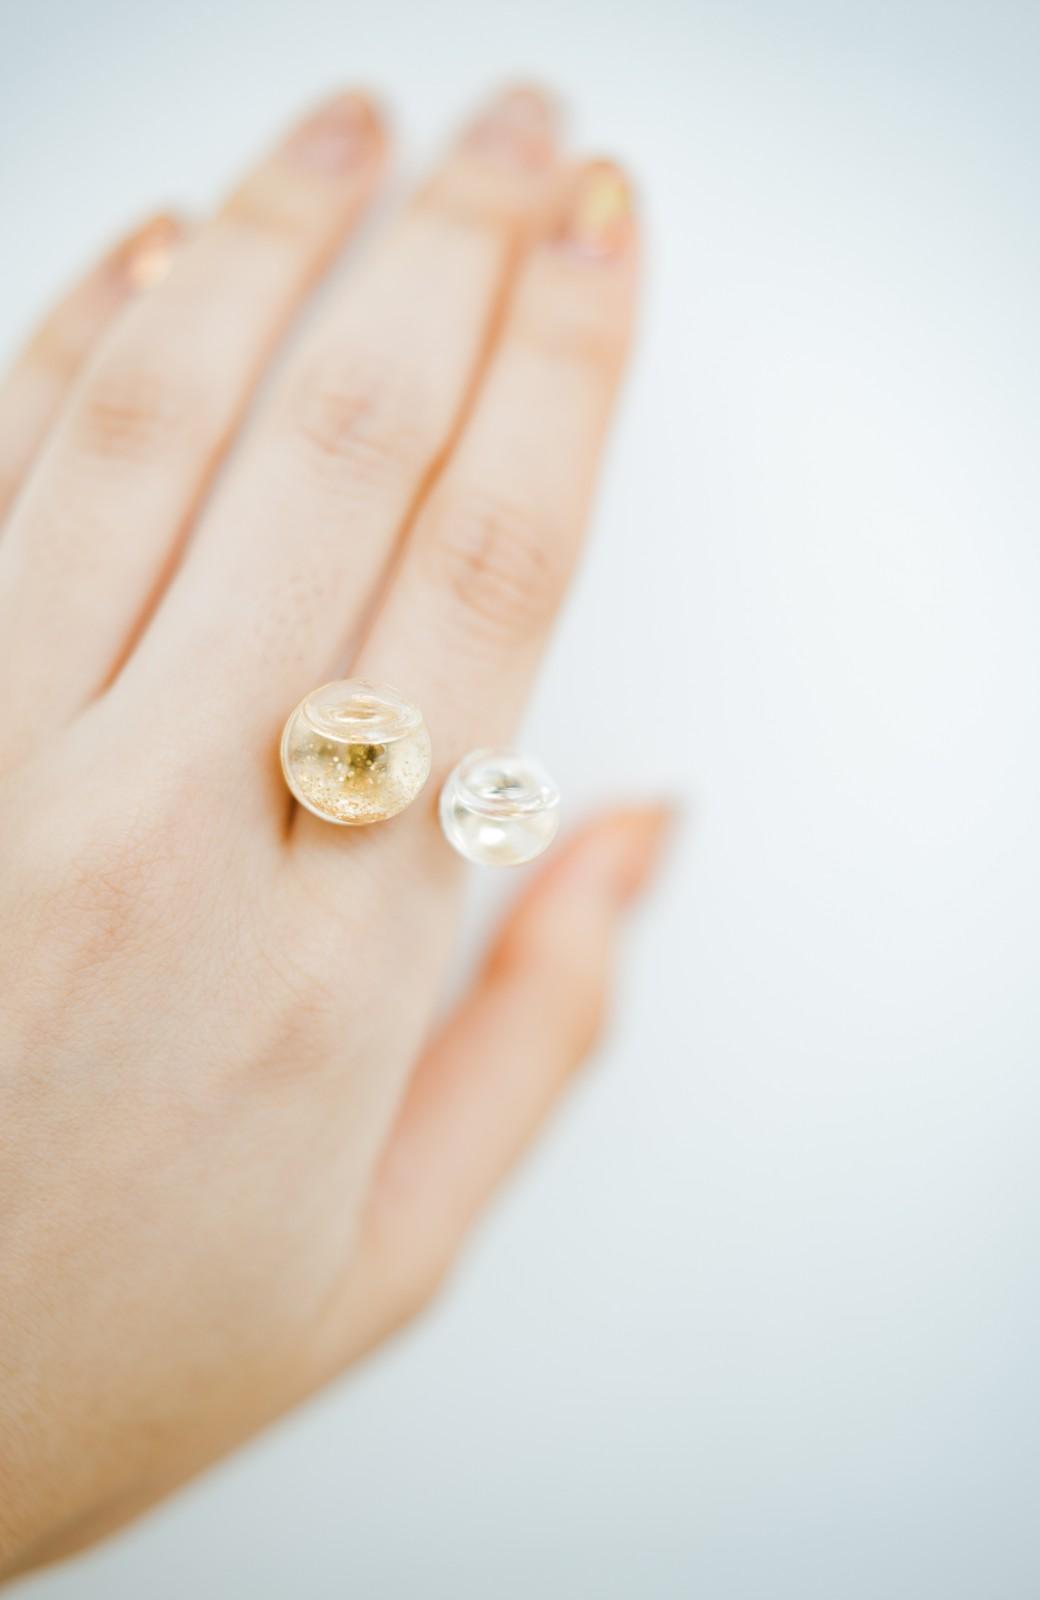 haco! てとひとて KANA MATSUNAMI チャリティー企画 W Glass dome リング <ゴールド>の商品写真3